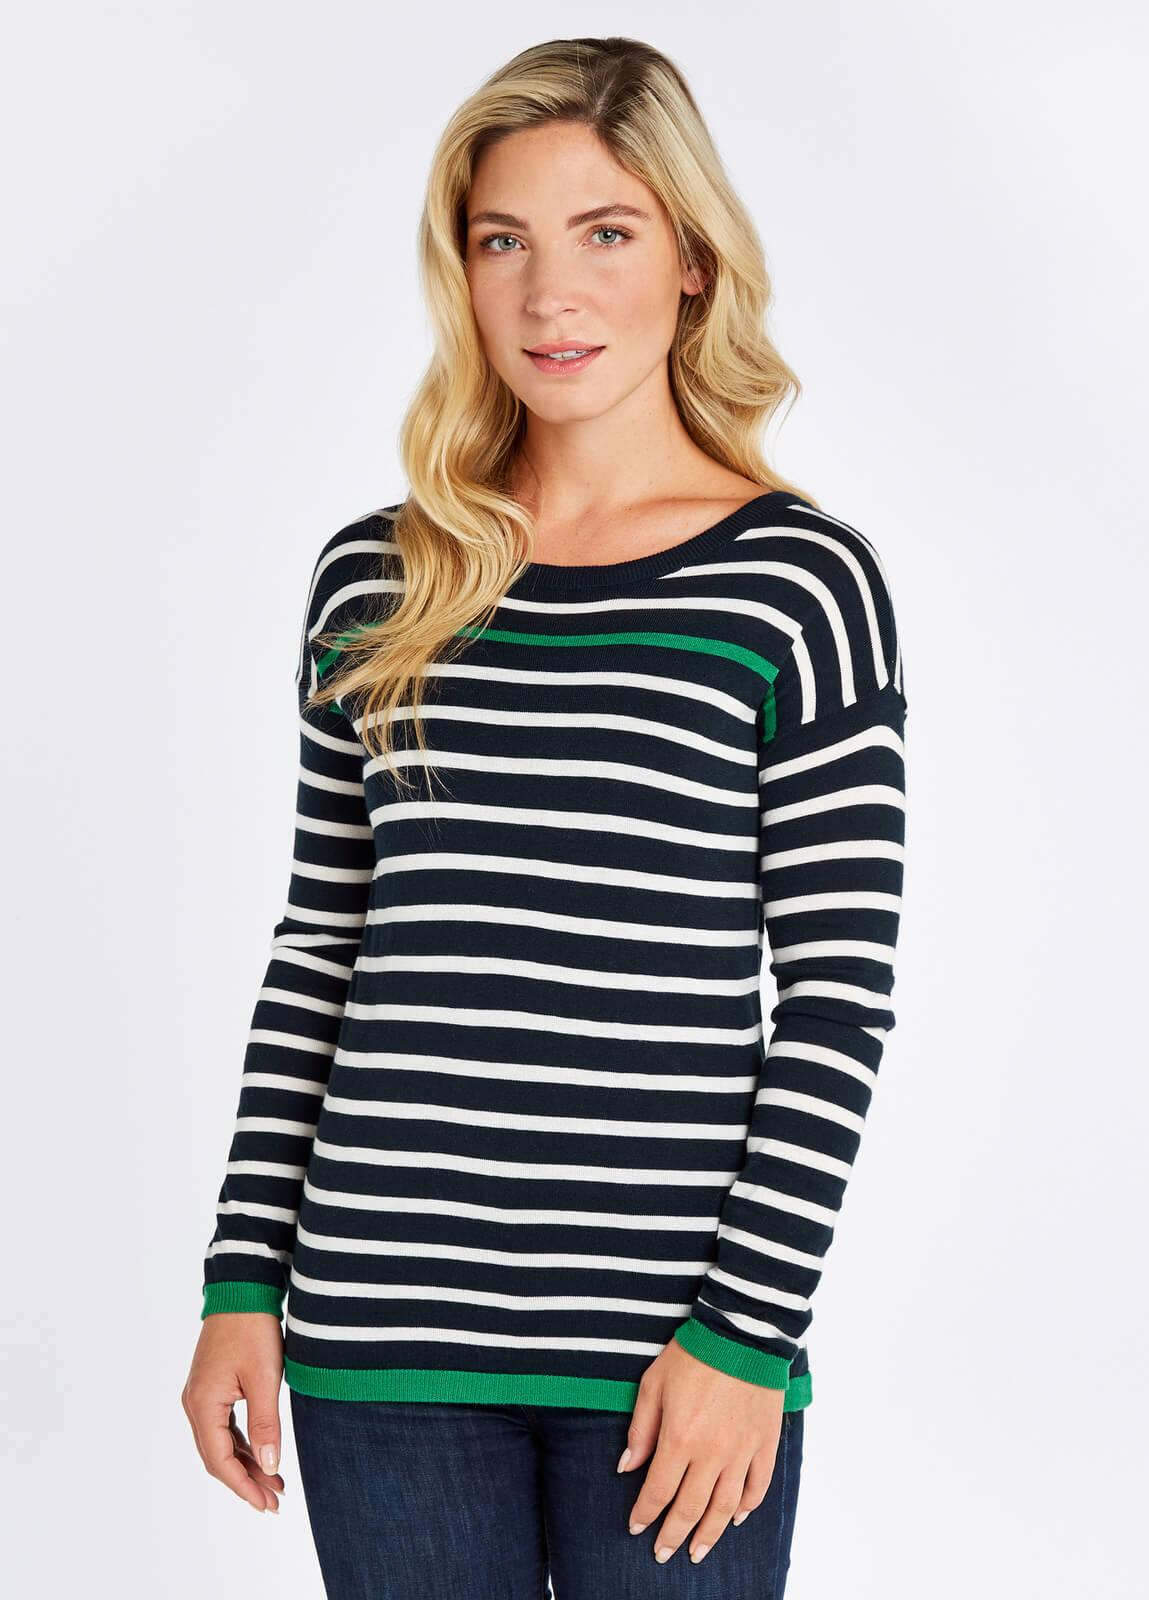 Leixlip_Sweater_Navy_Multi_on_model